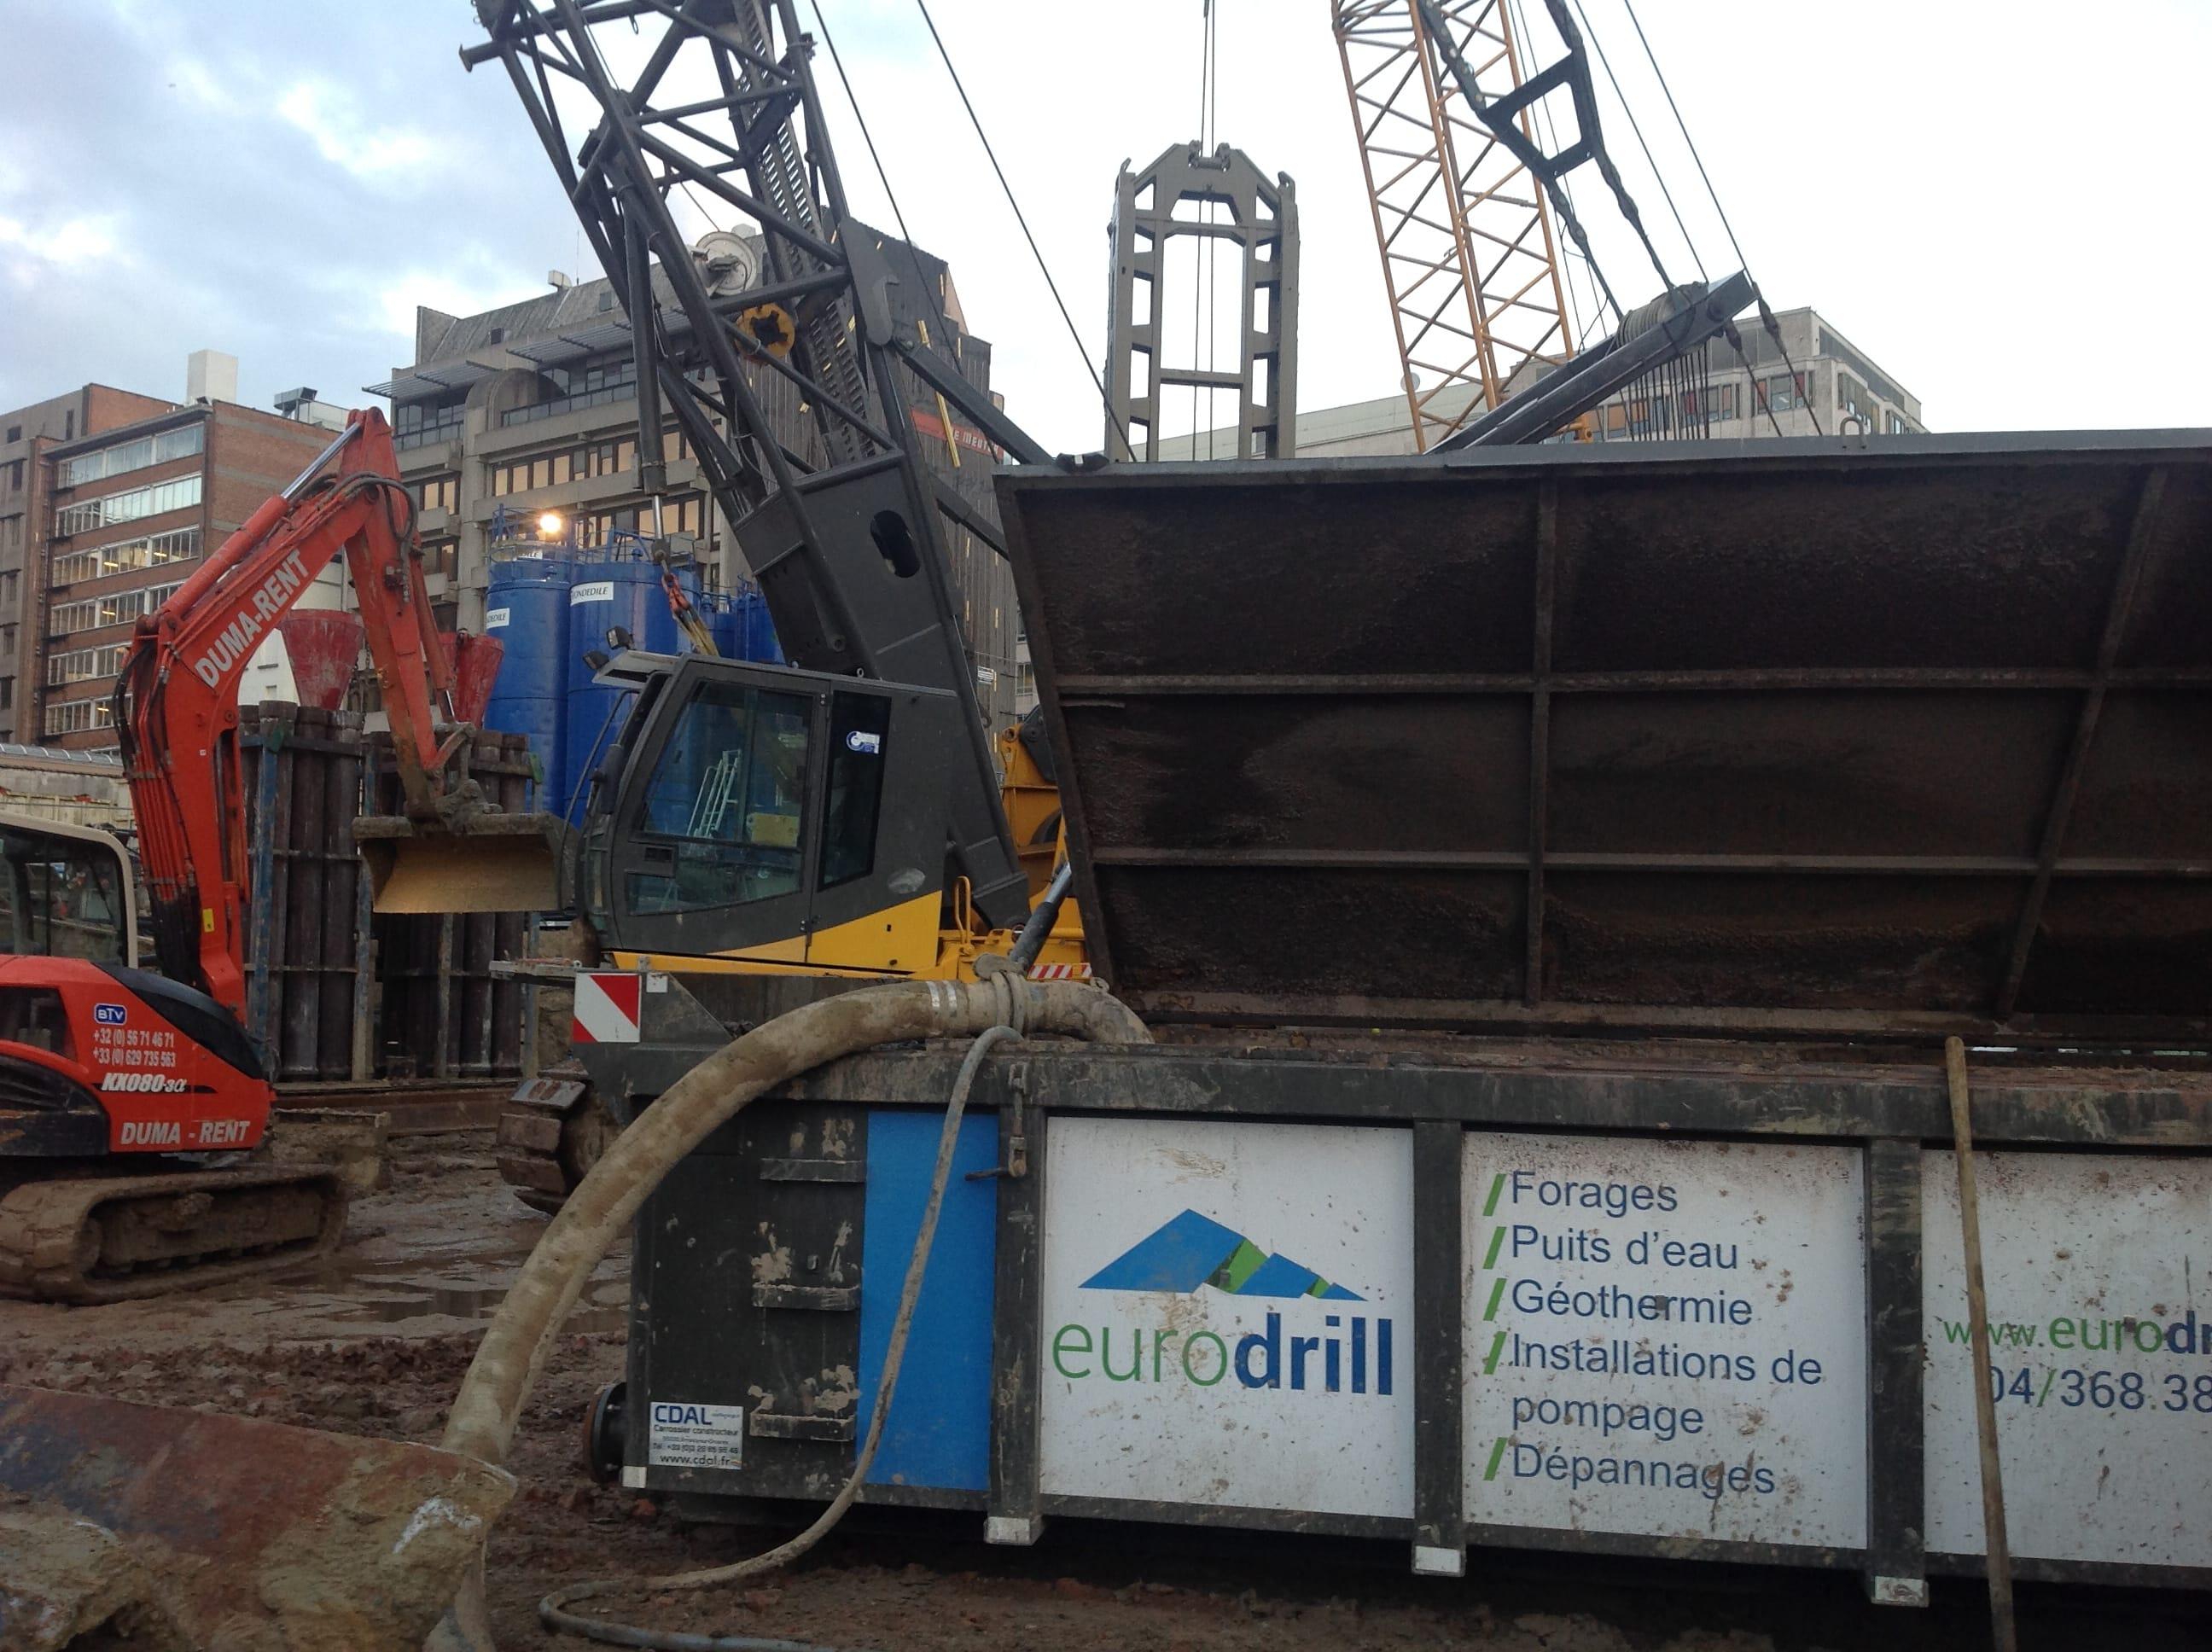 chantier-bruxelles-forage-installation-pompe-puits-geothermie-eurodrill-liege-belgique-6